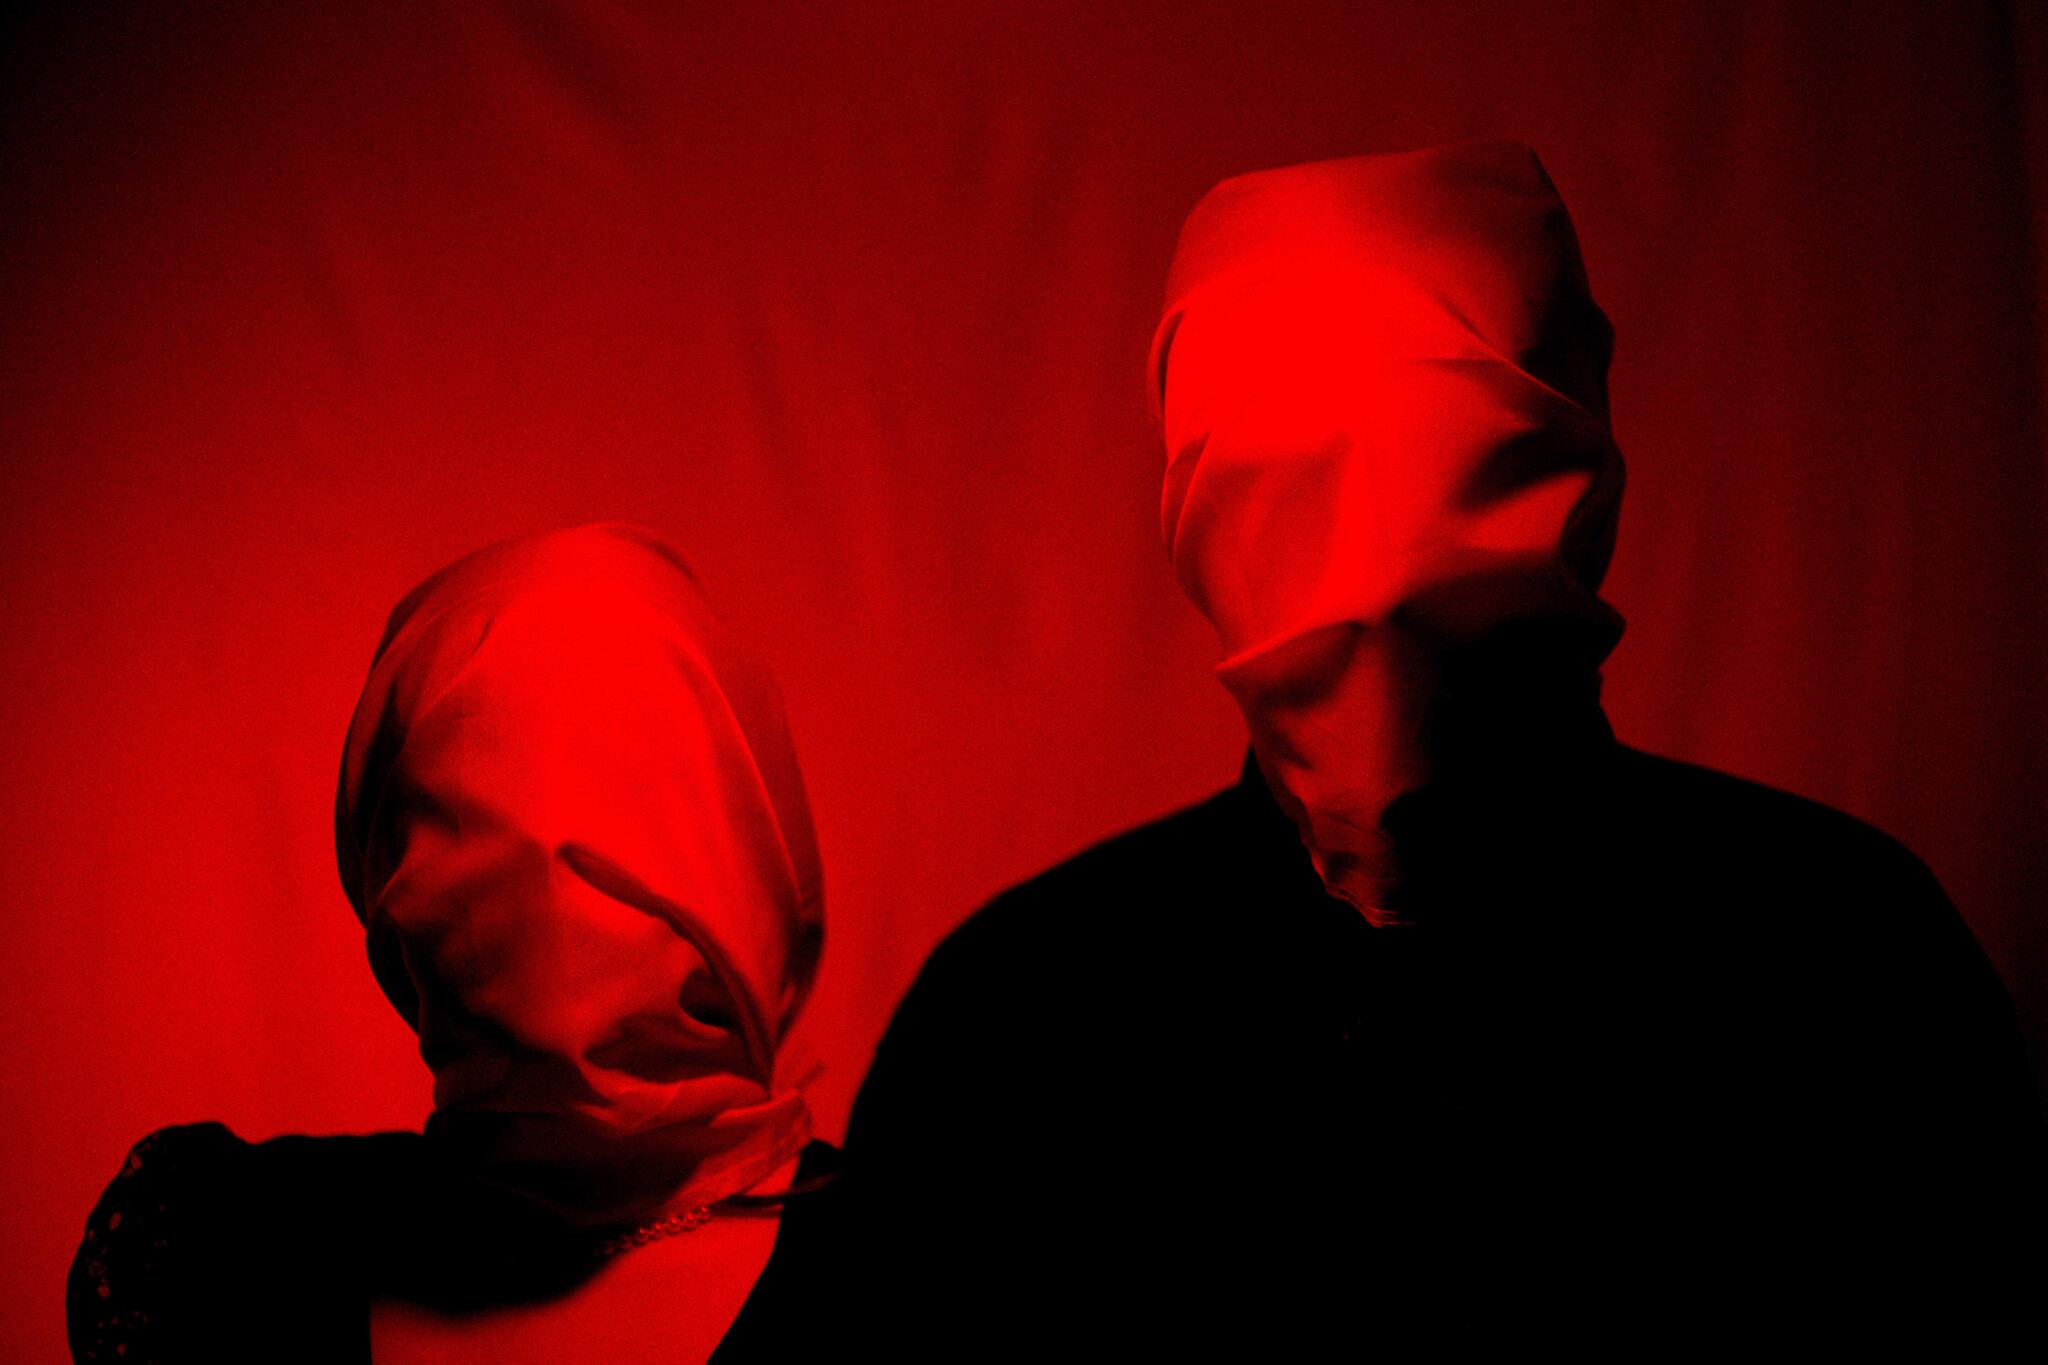 Qlowski band photo from Plowski band page on Underground music blog